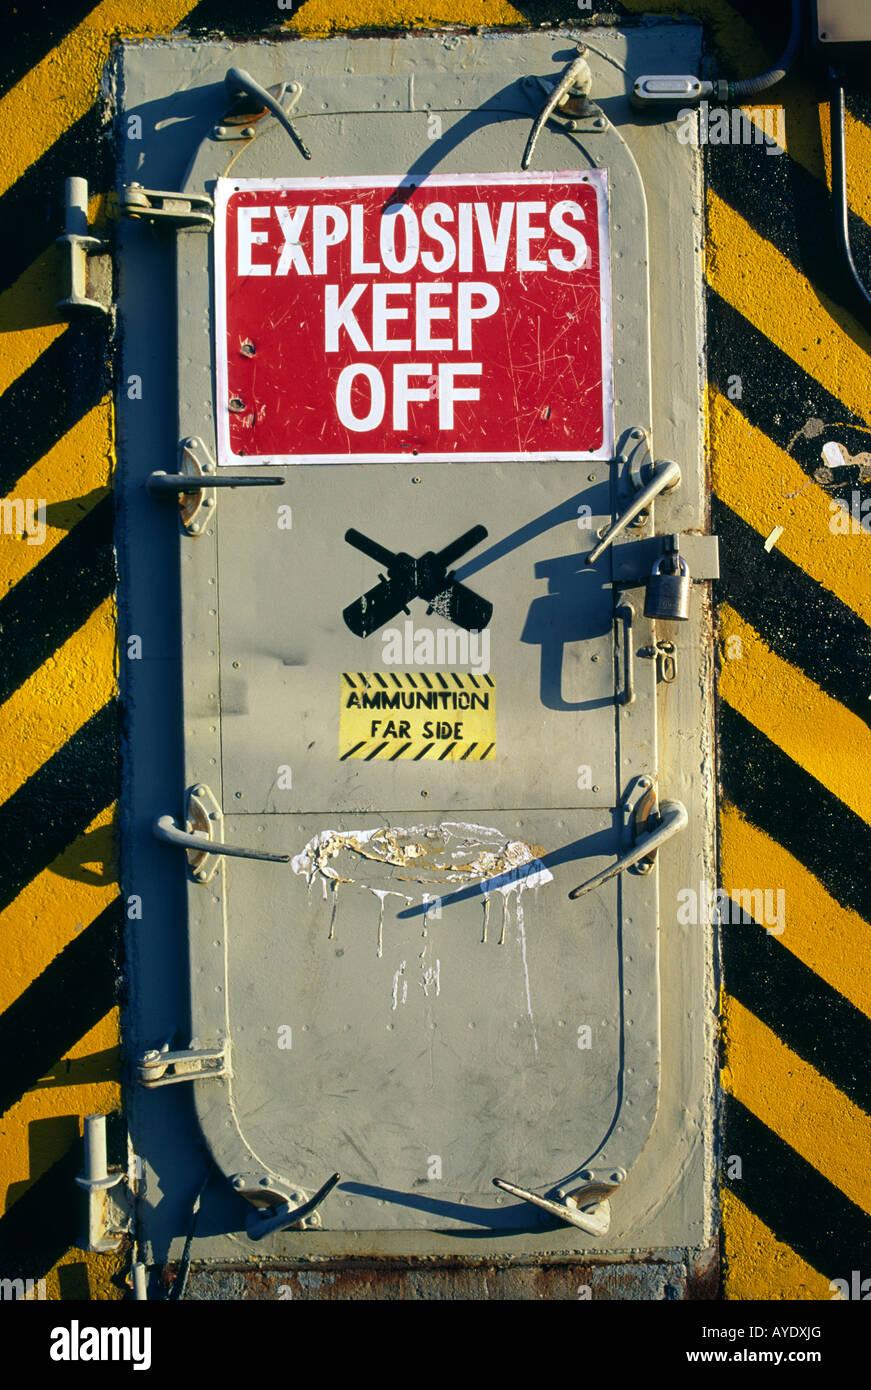 Explosives bunker door at the Charlestown Navy Yard in Boston Massachusetts - Stock Image